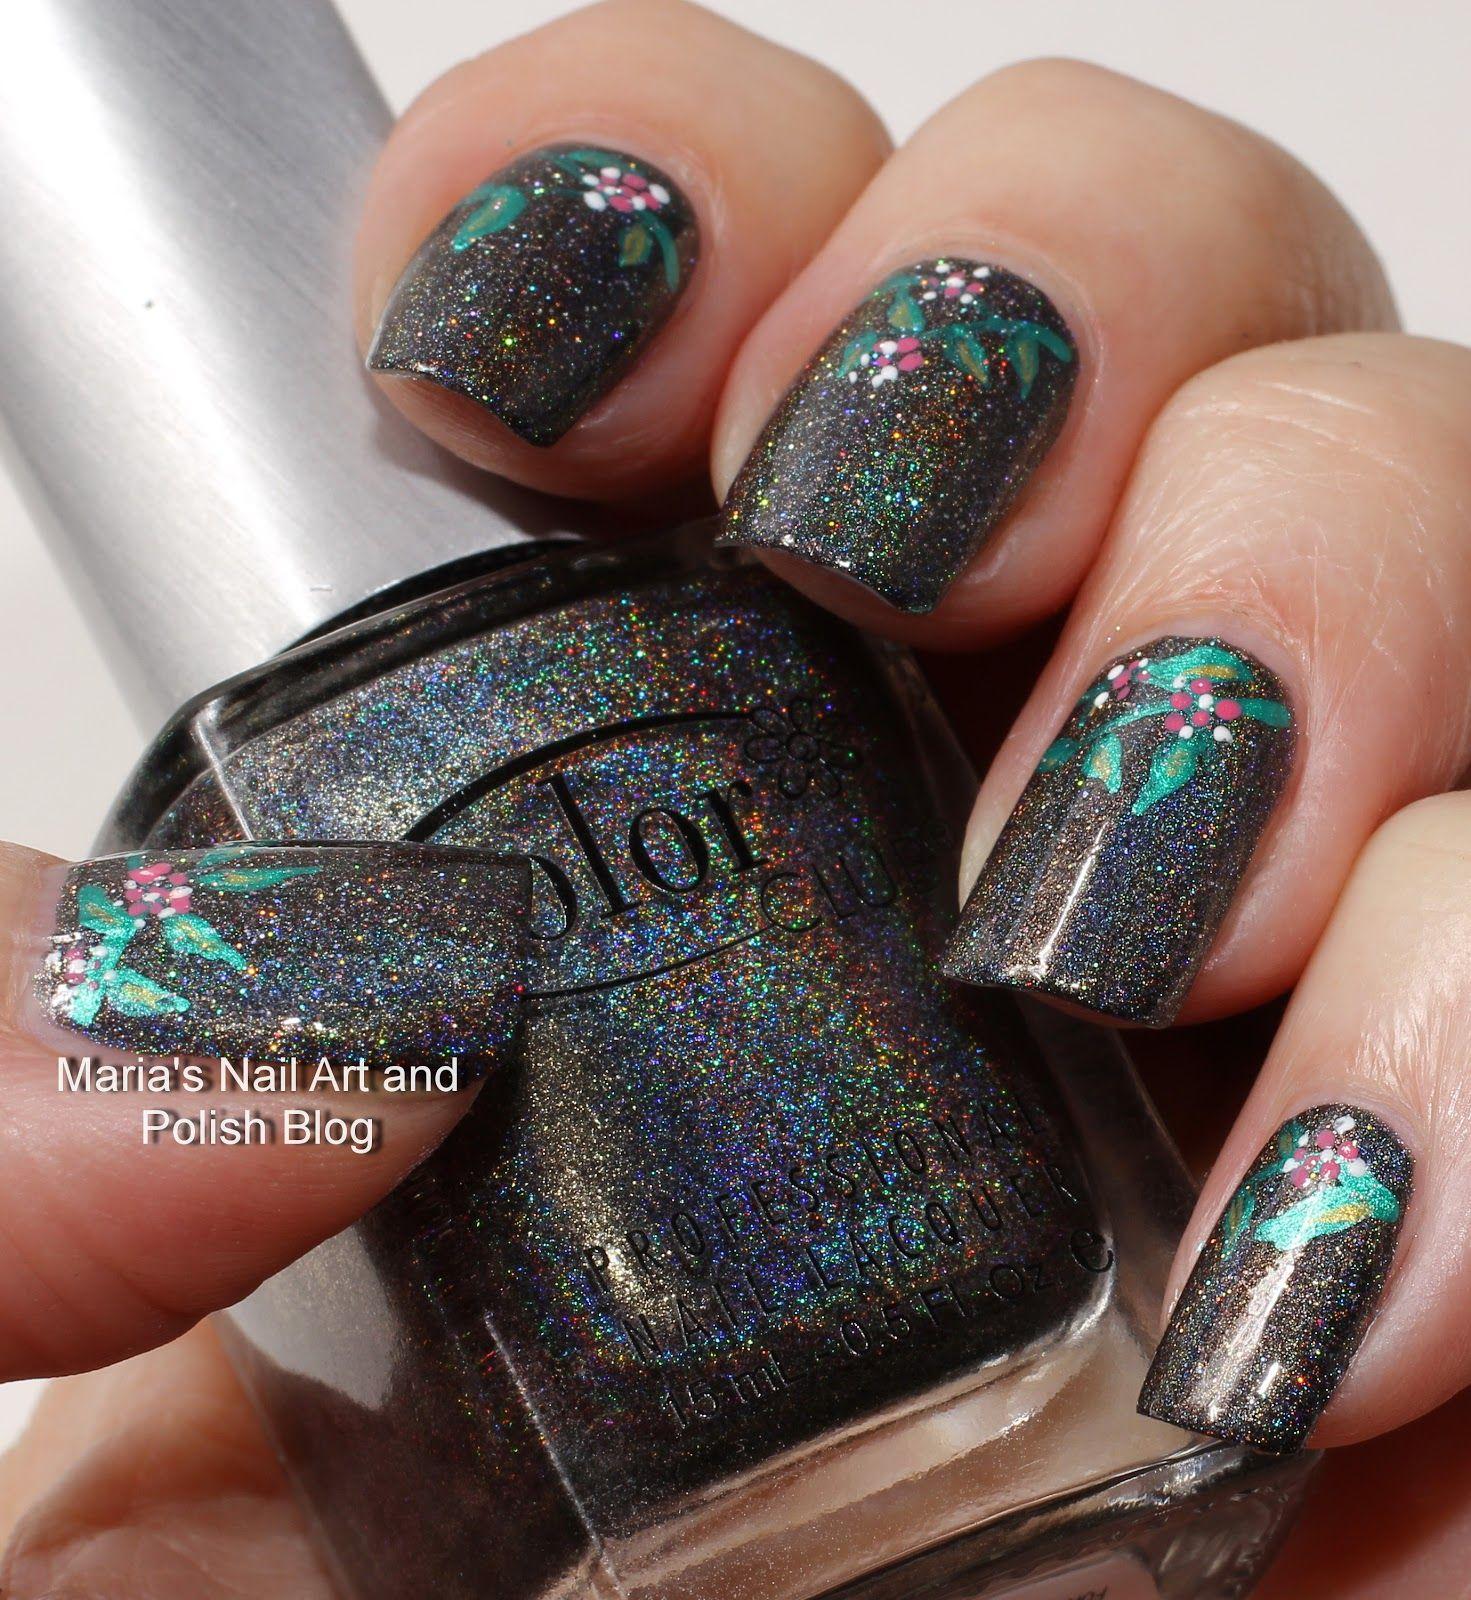 Beyond holo and glitter - nail art